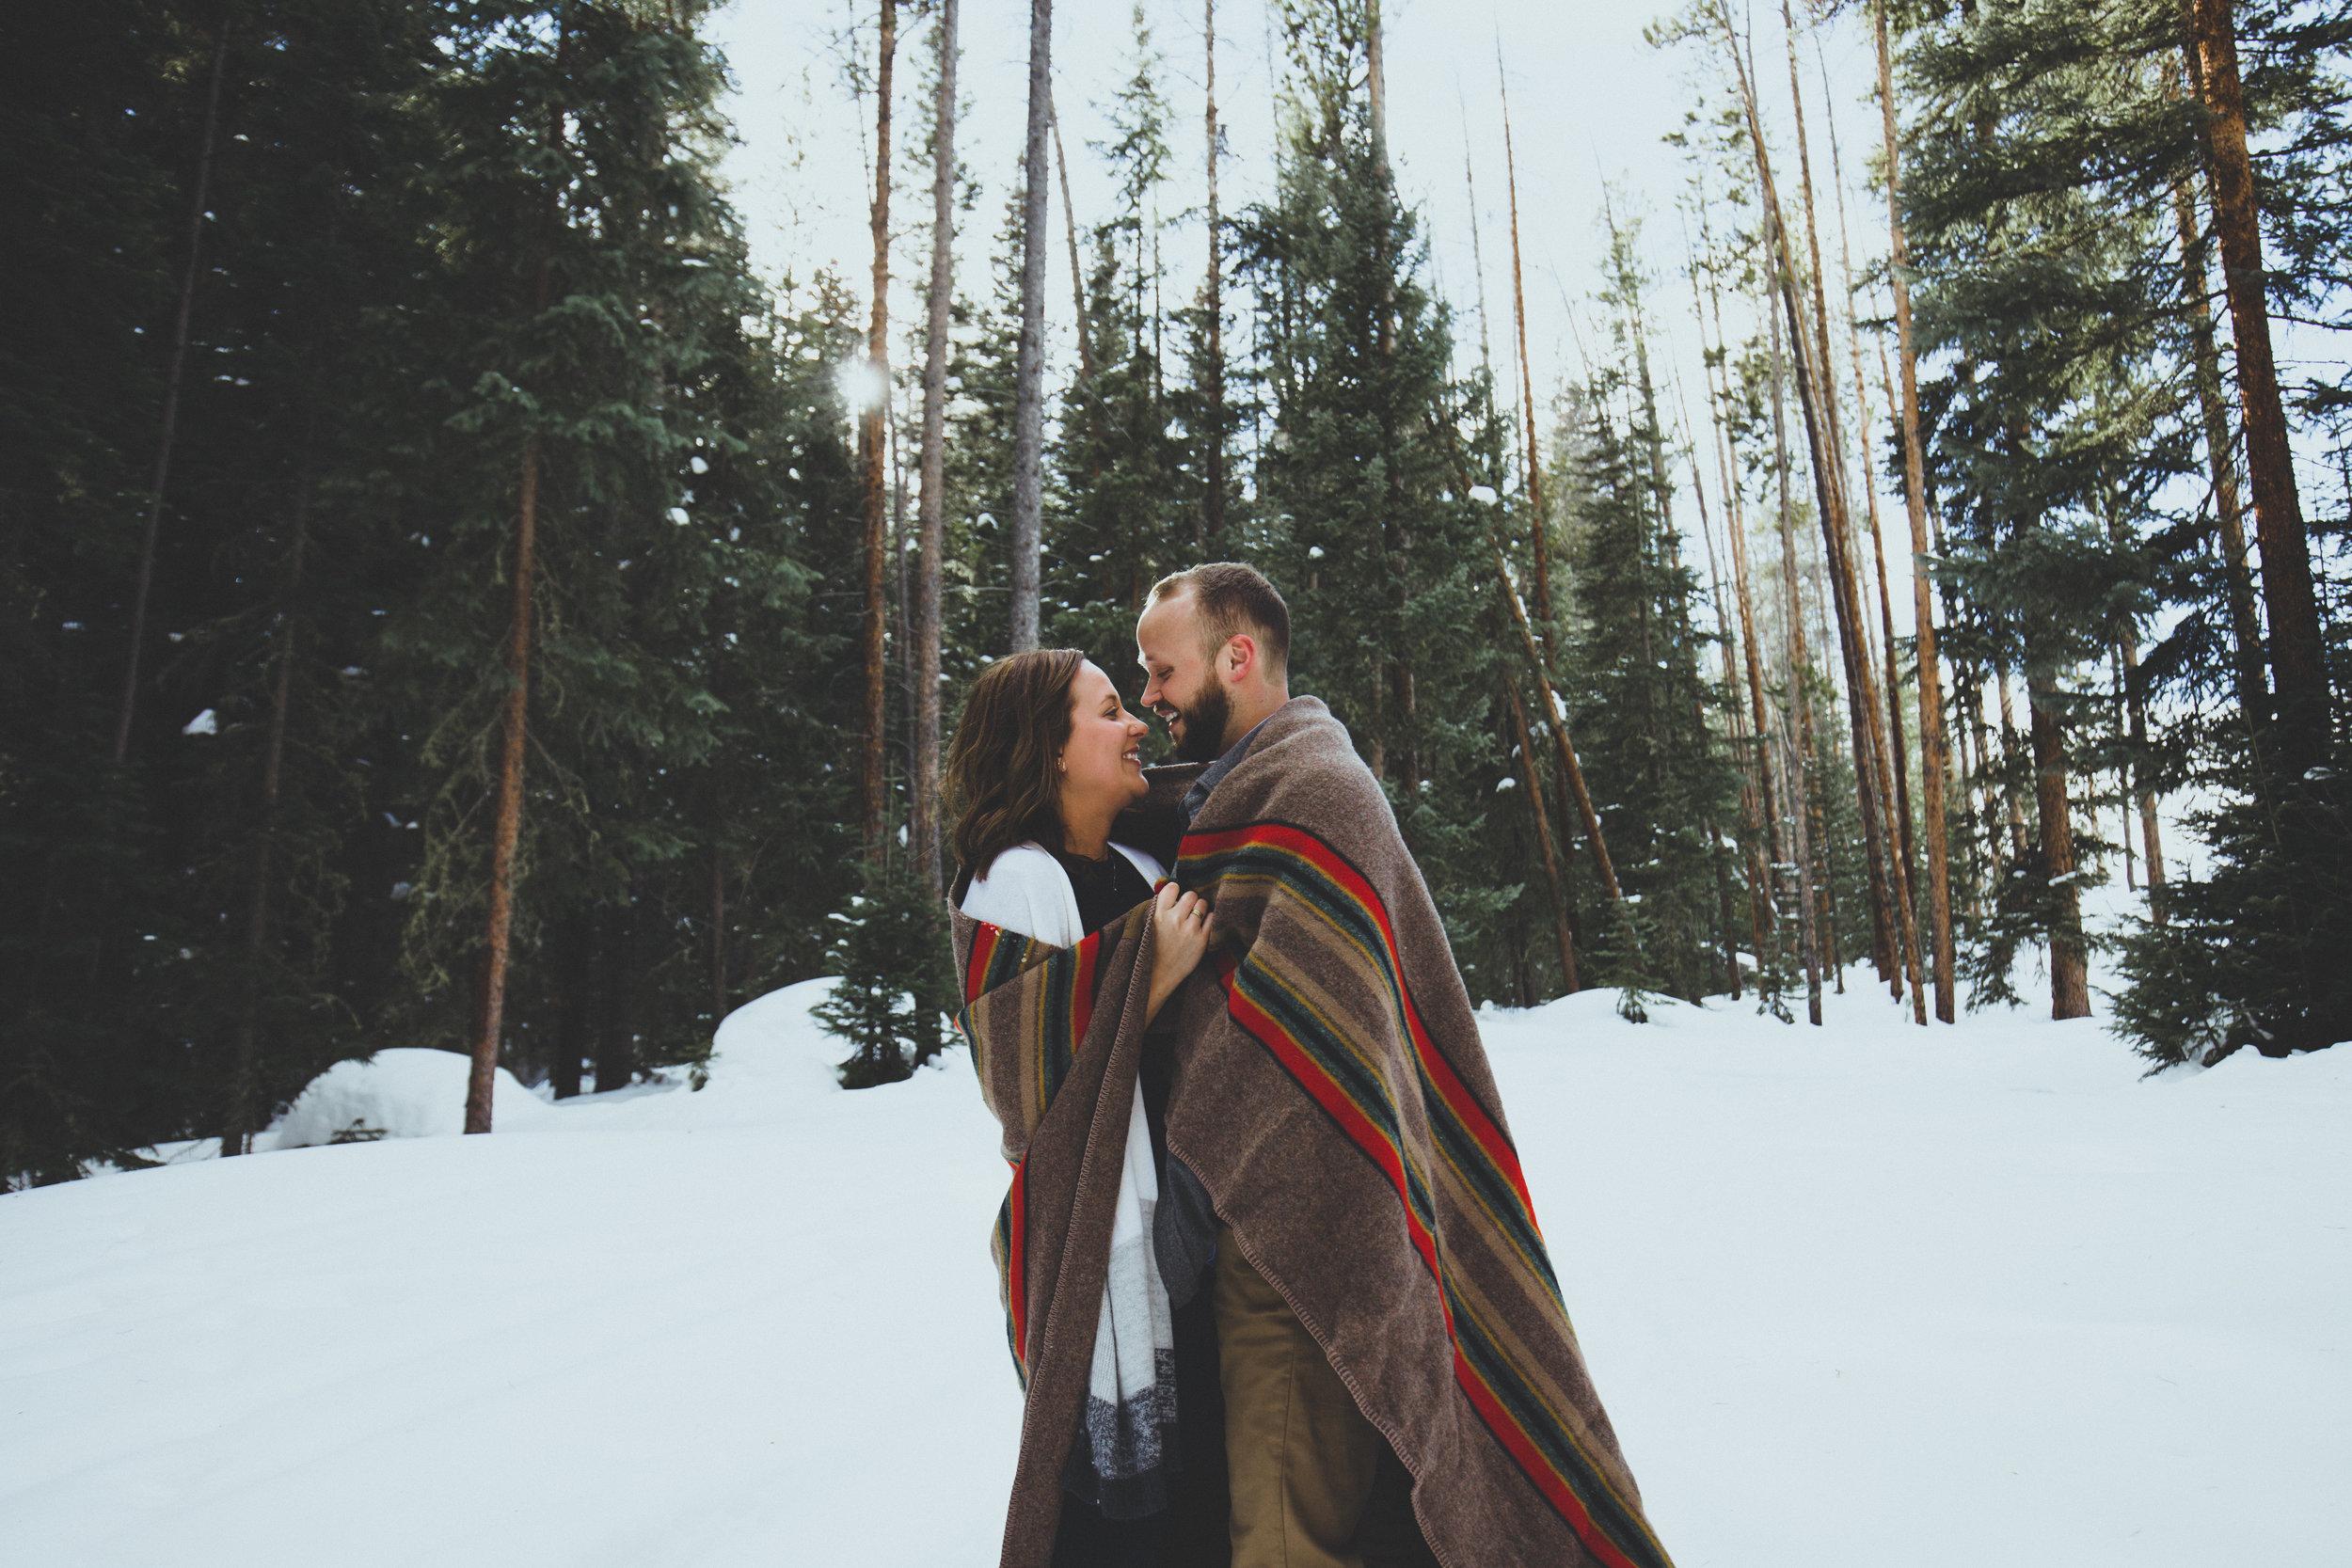 winter-park-colorado-engagement-photography